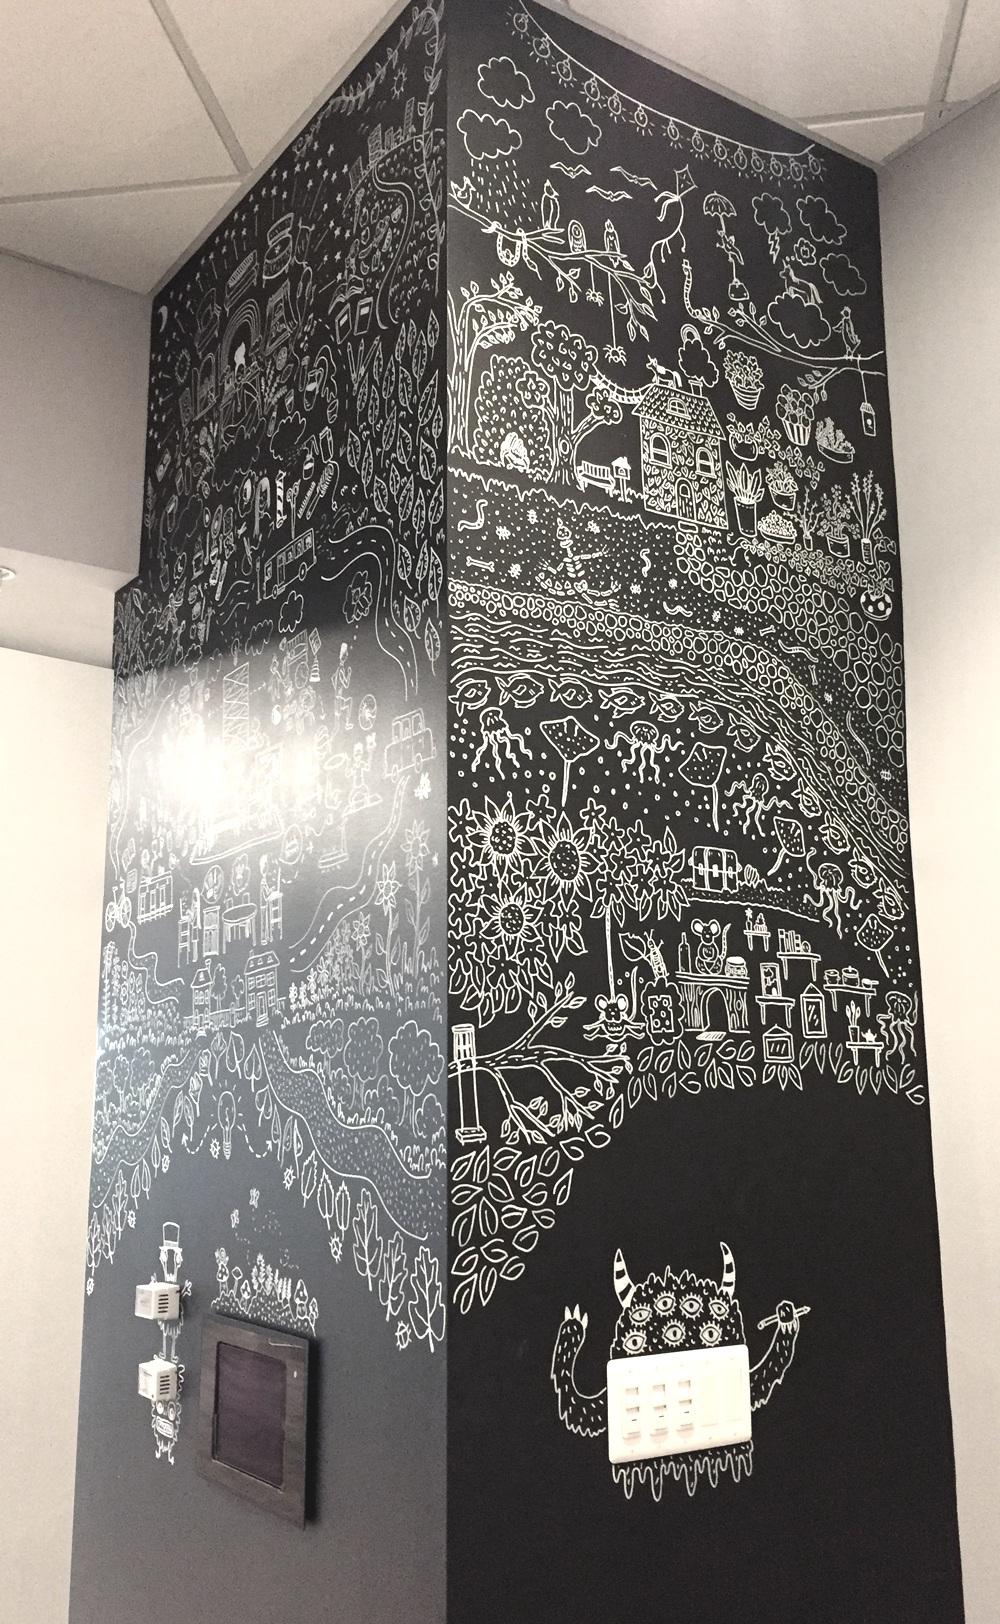 Chalkboard wall drawing